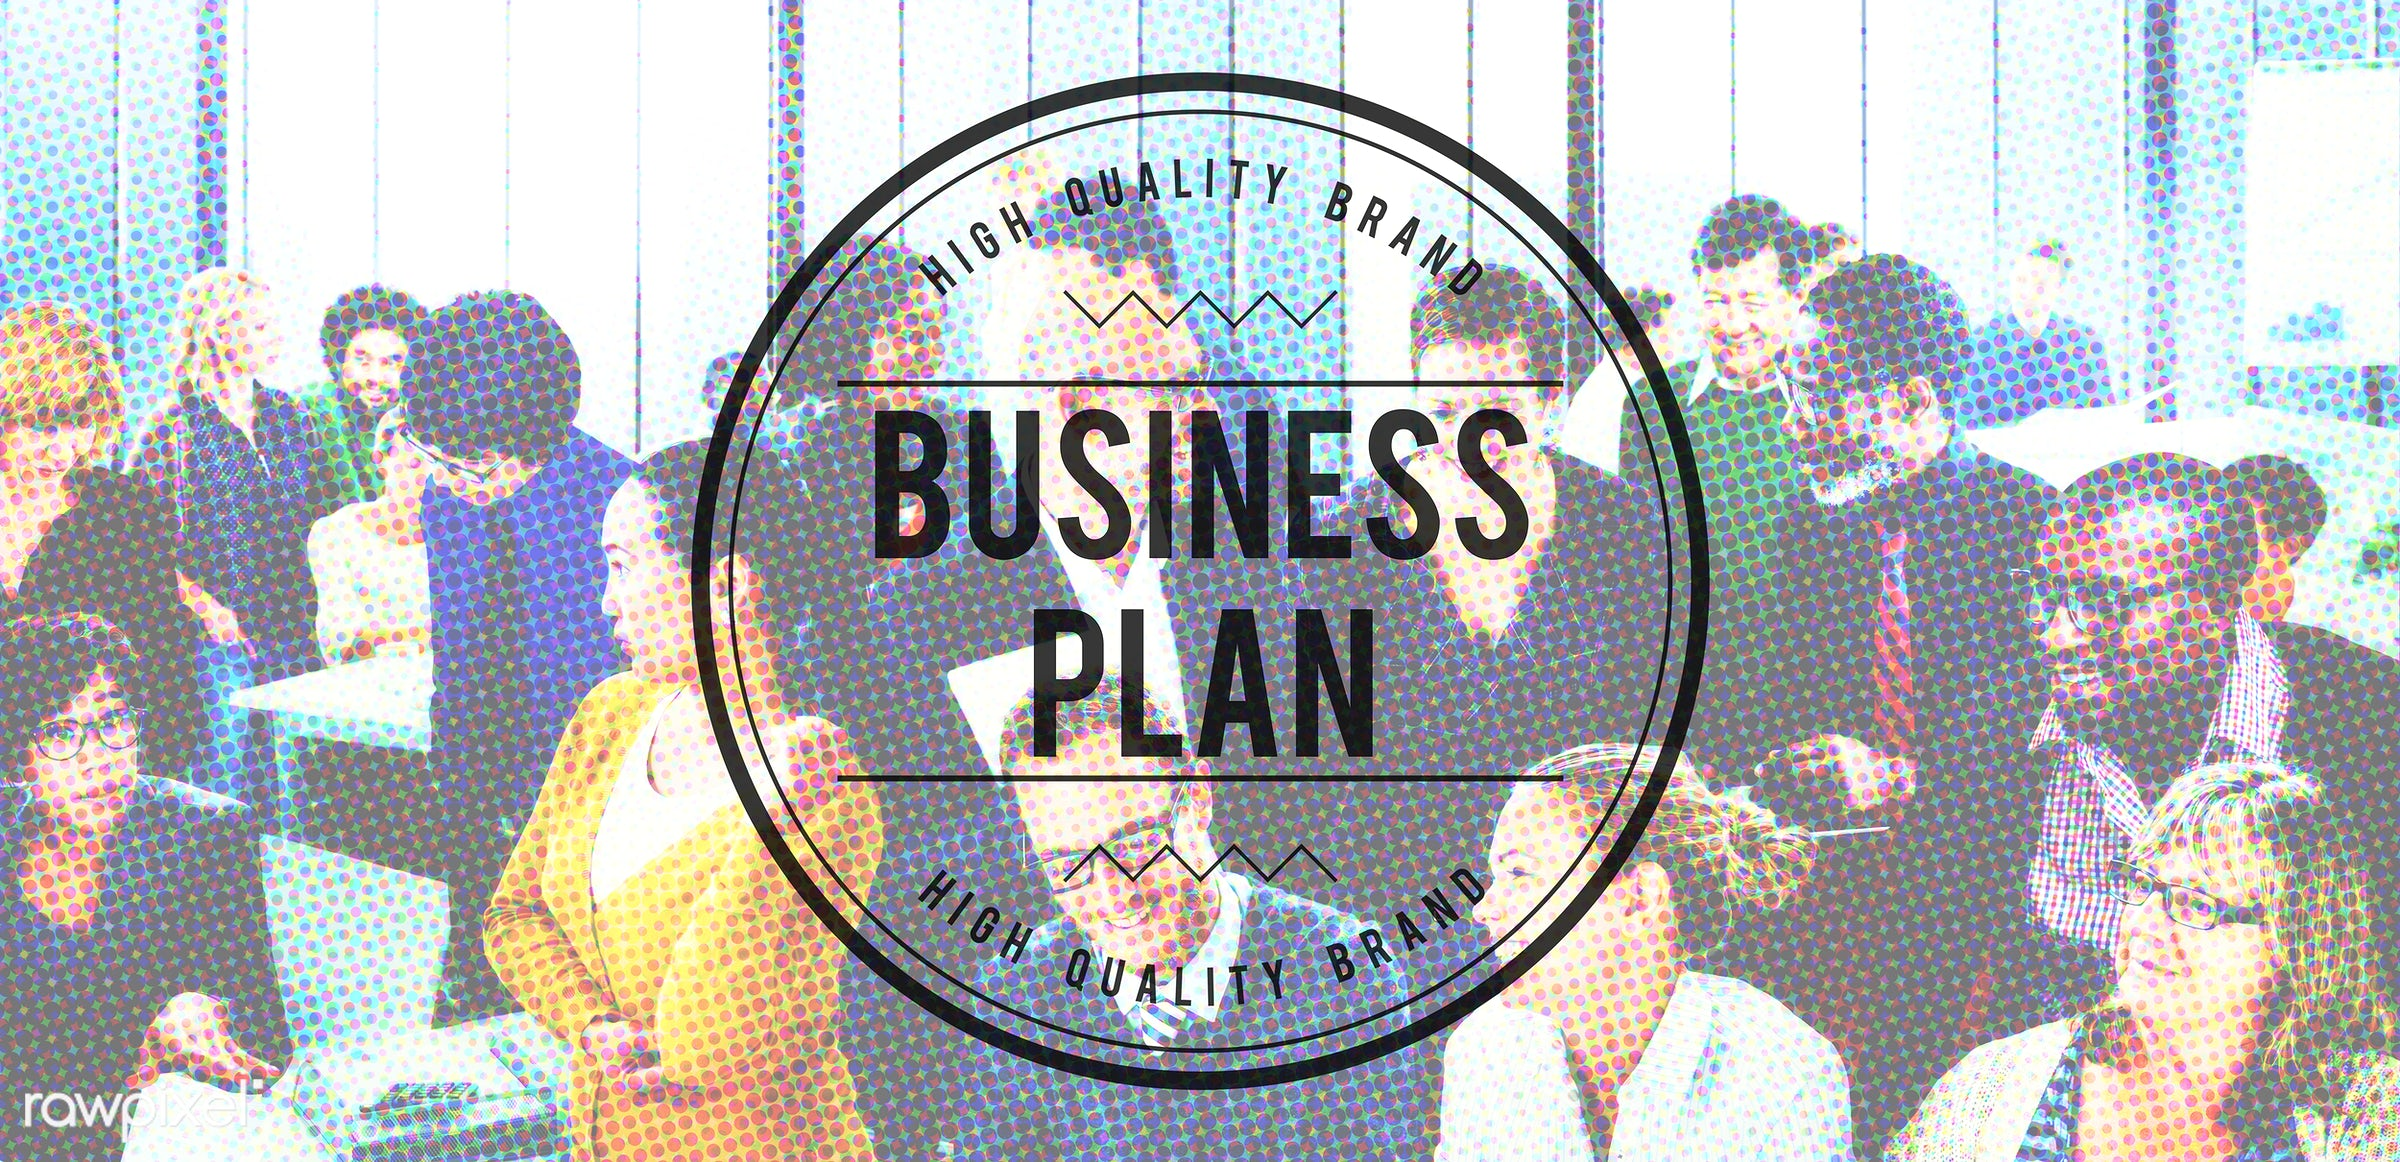 african descent, asian ethnicity, badge, banner, brand, branding, business, business plan, businessmen, businesswomen, busy...